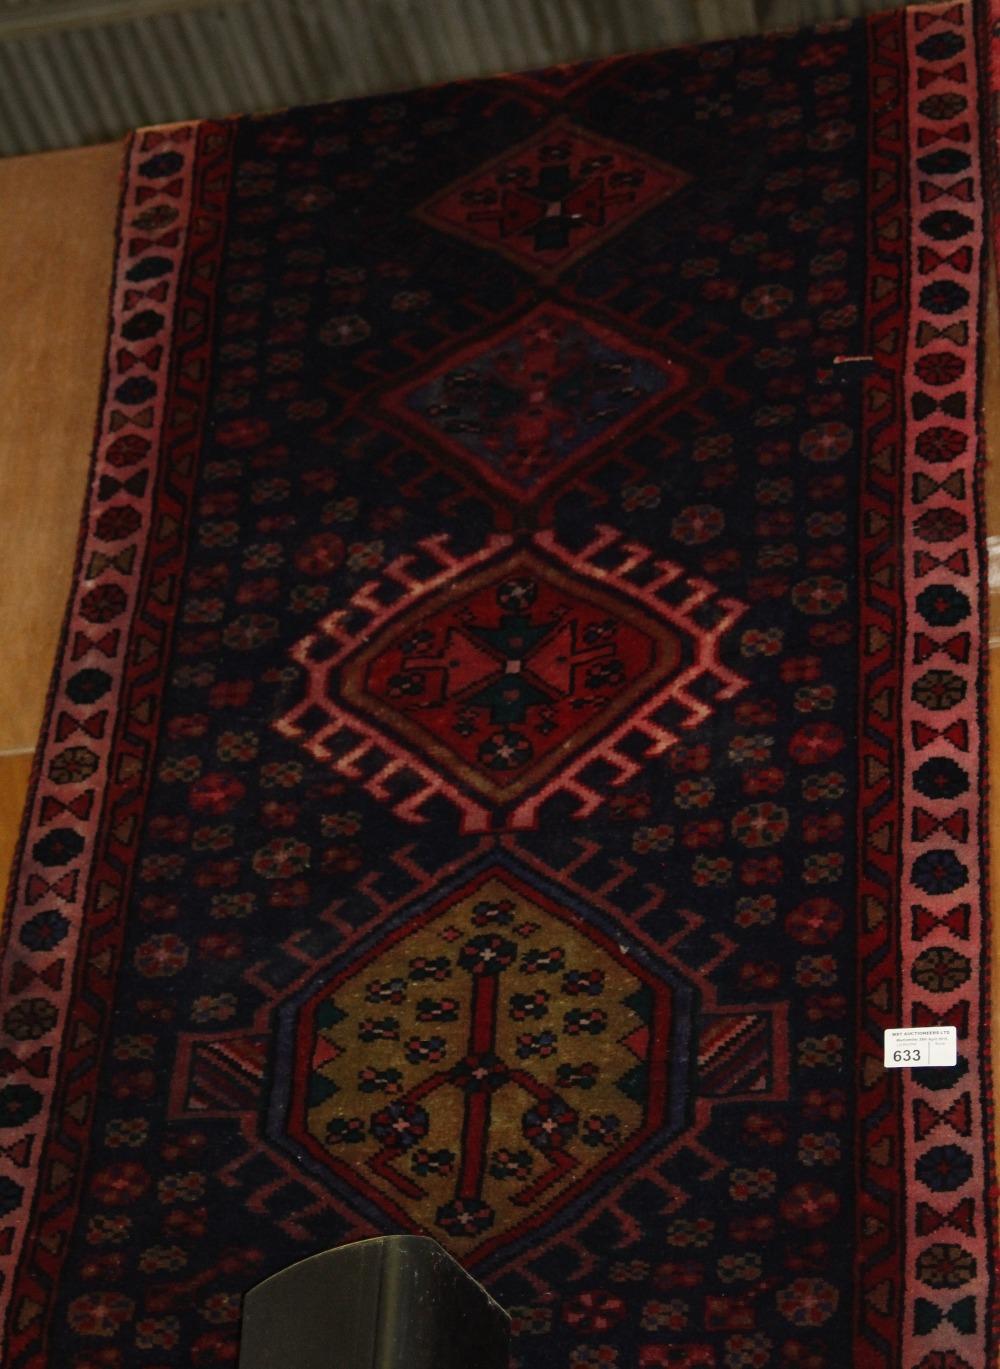 Lot 633 - NV- a hand woven blue ground Persian runner. Approx. 310 X 100cm